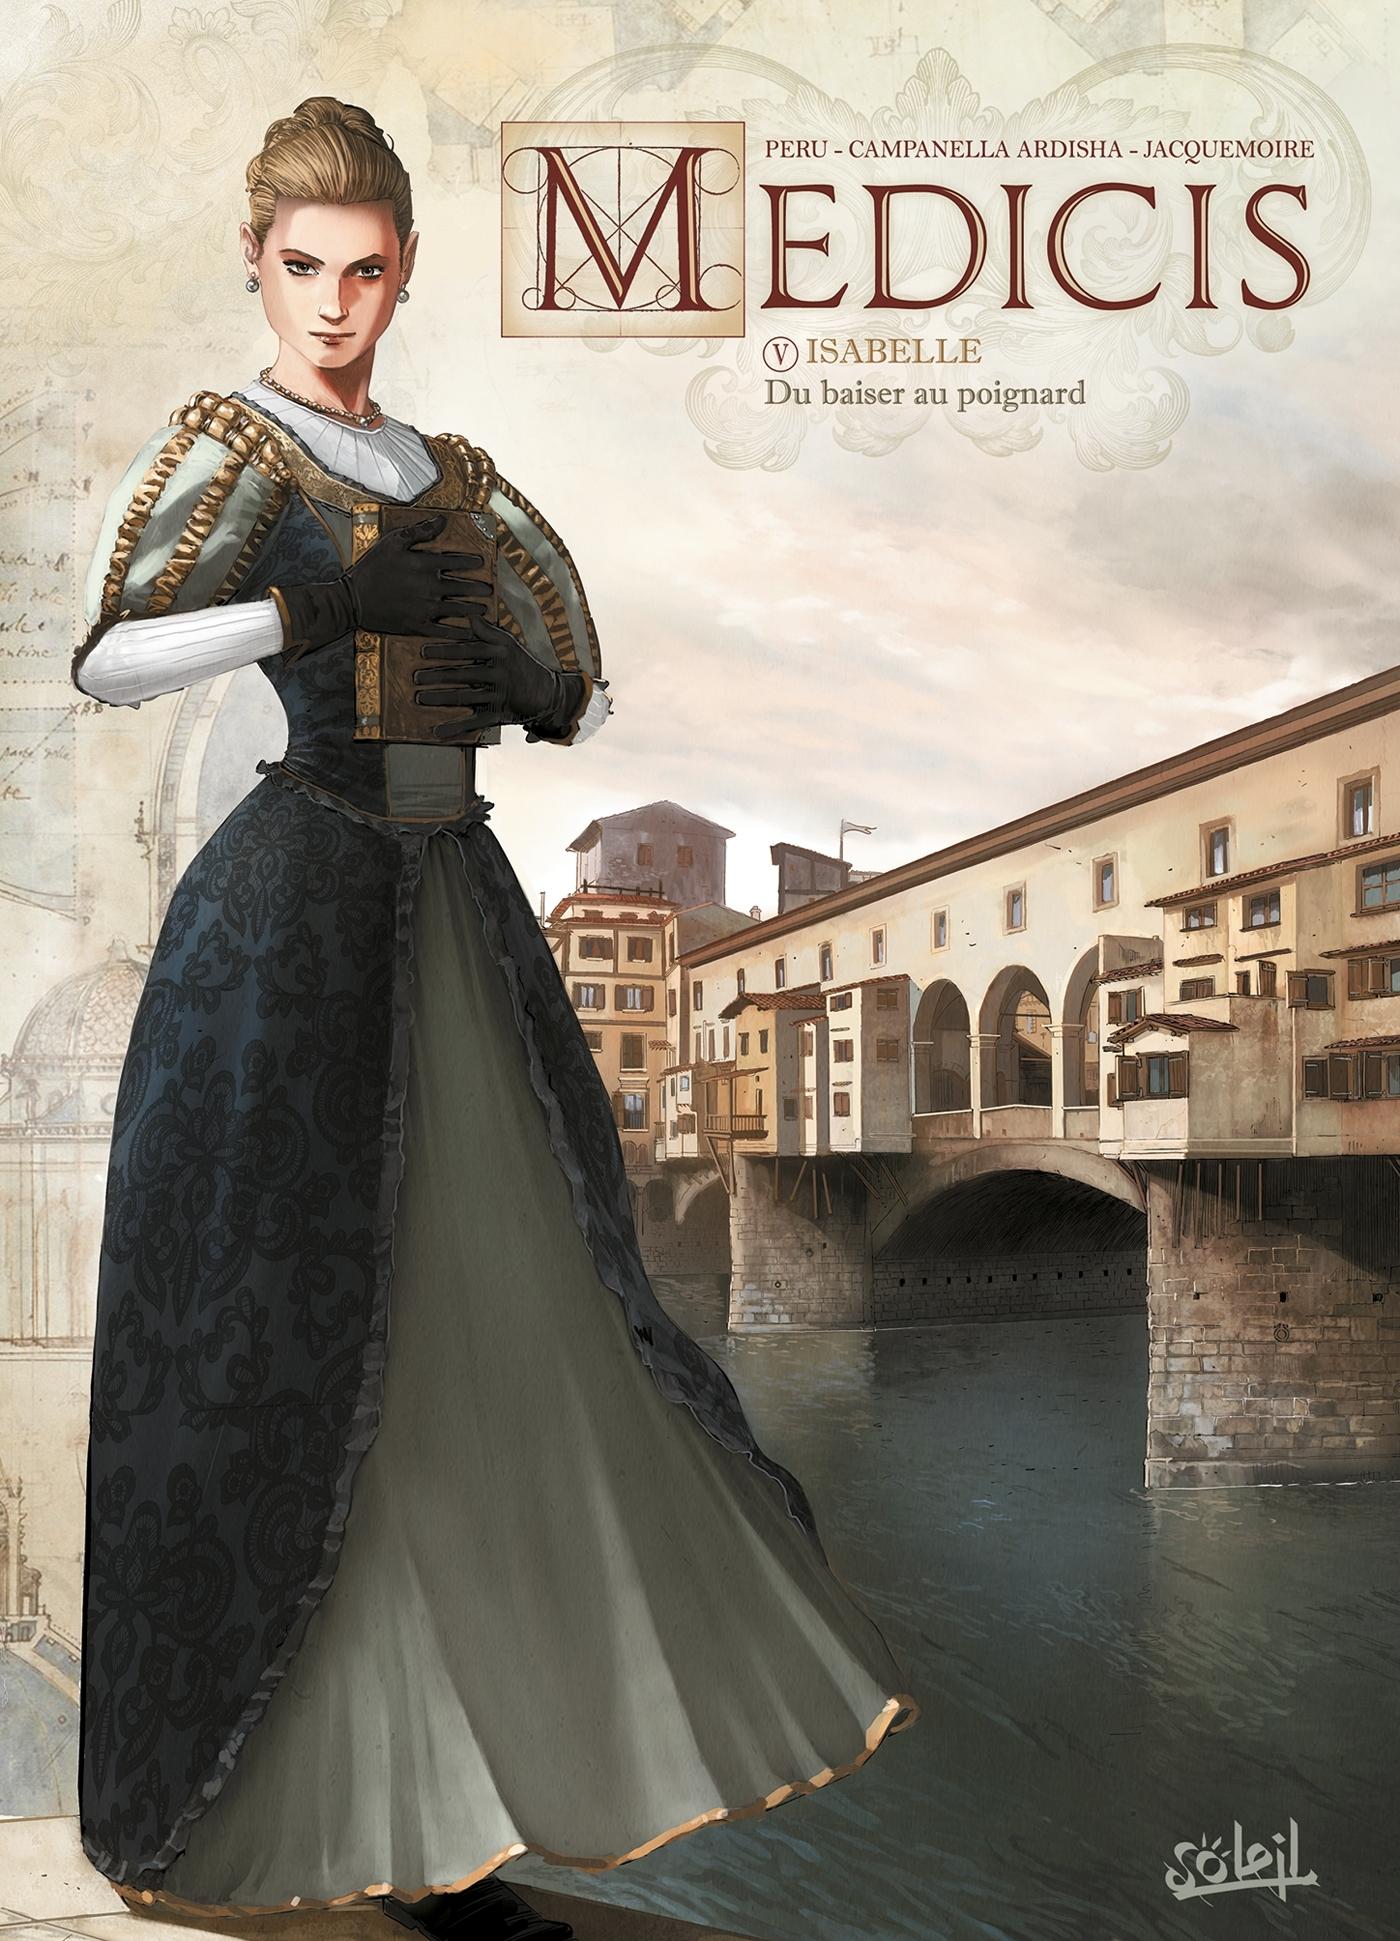 MEDICIS 05 - ISABELLE - DU BAISER AU POIGNARD